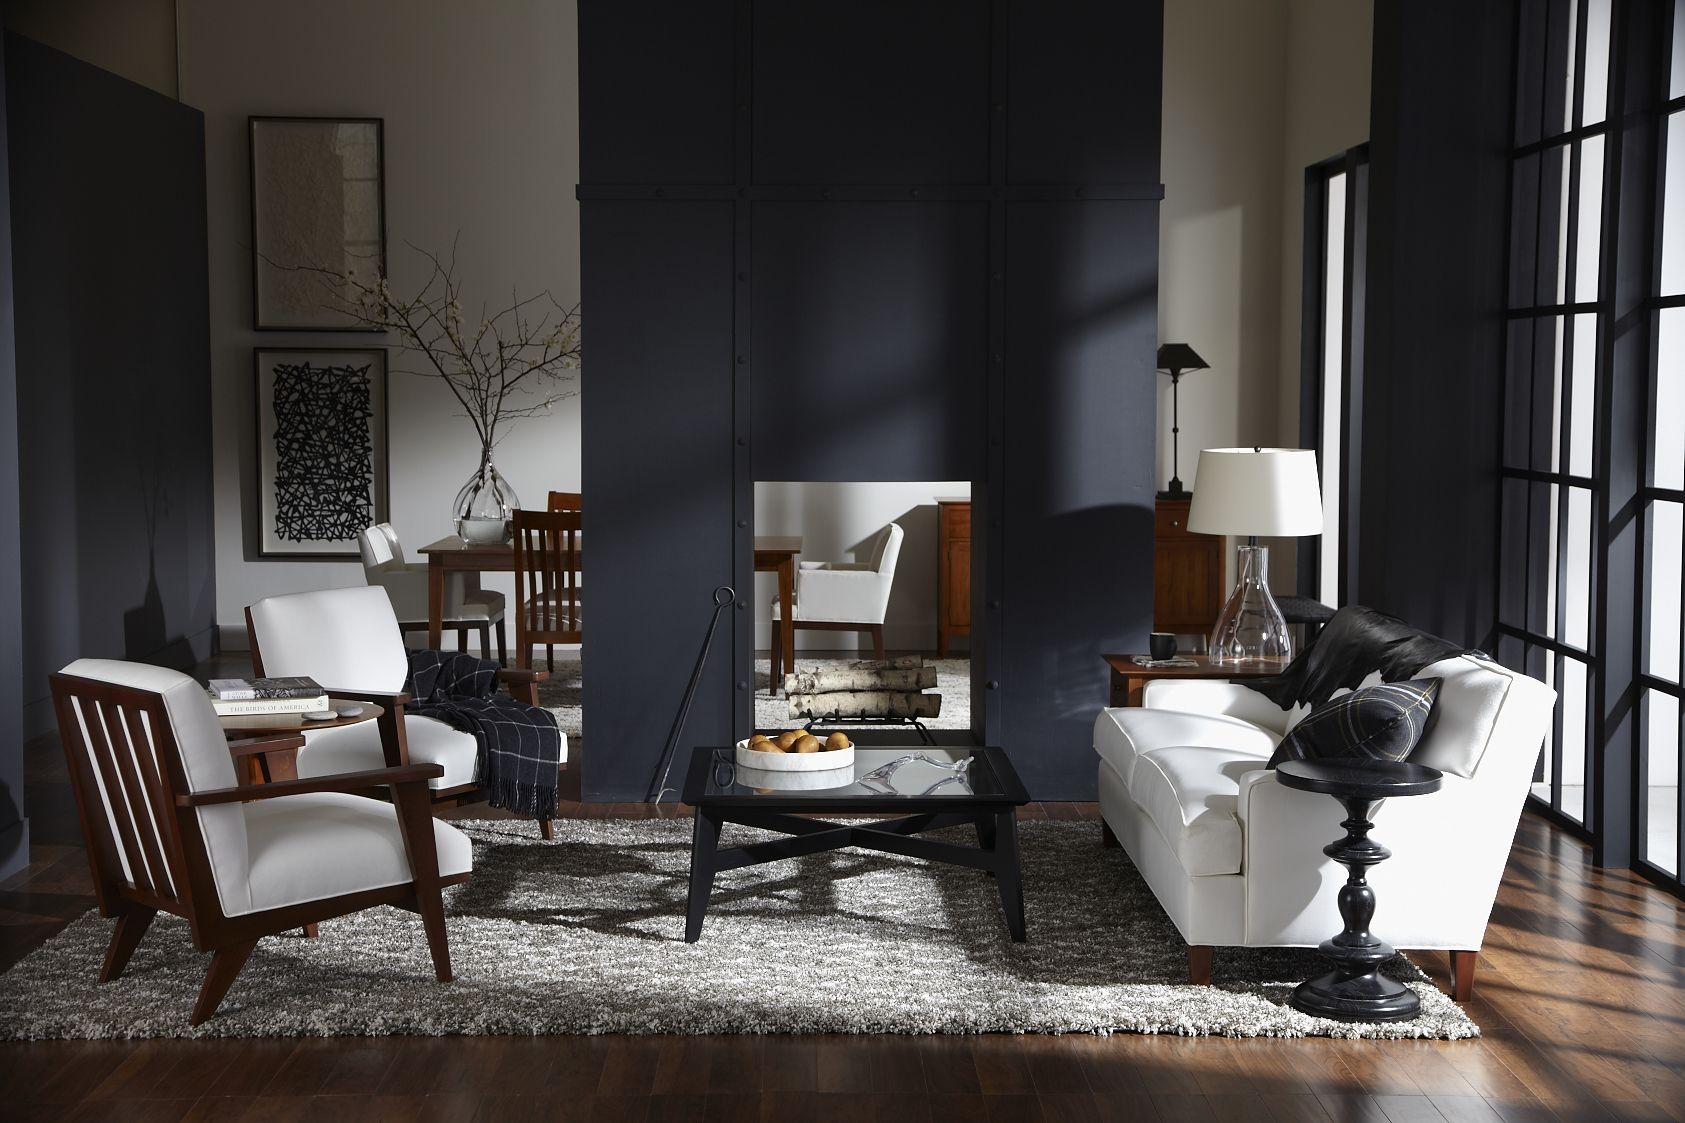 Living Room Furniture Ethan Allen Black And White Rooms Ethan Allen Modern Living Room Ethan